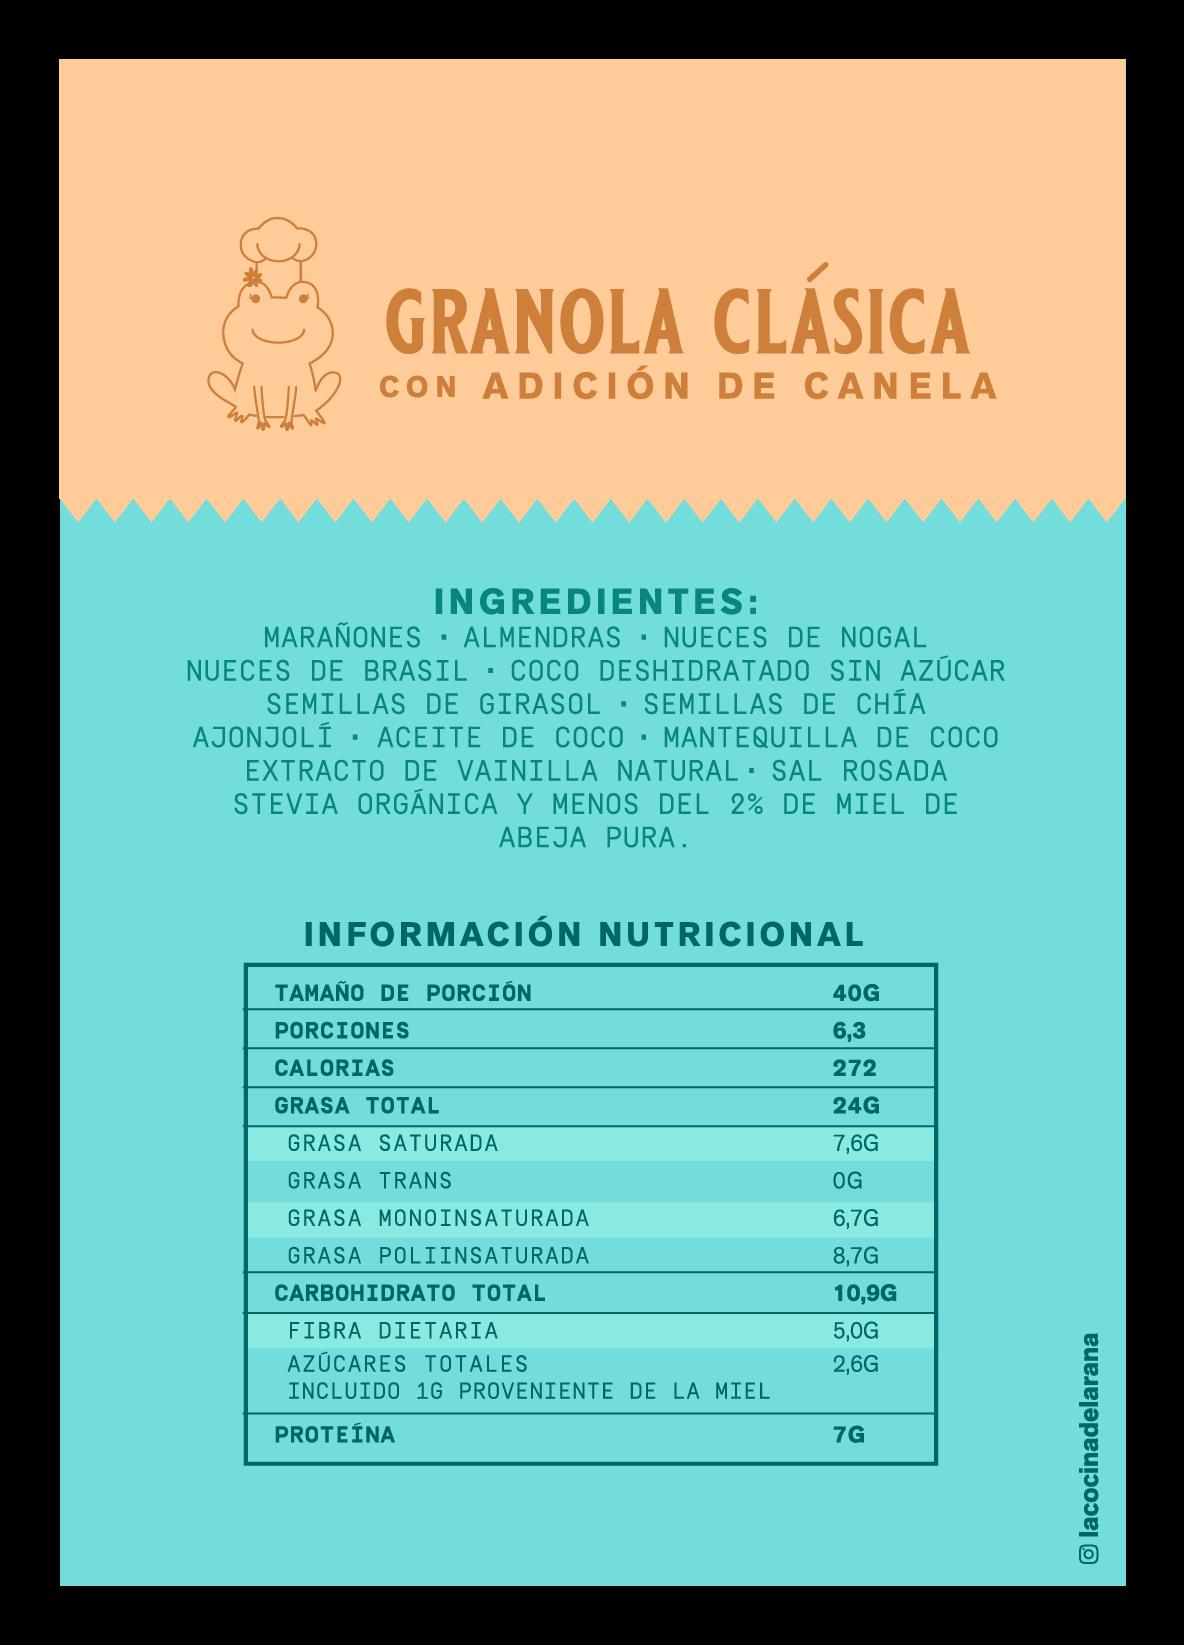 Granola clásica